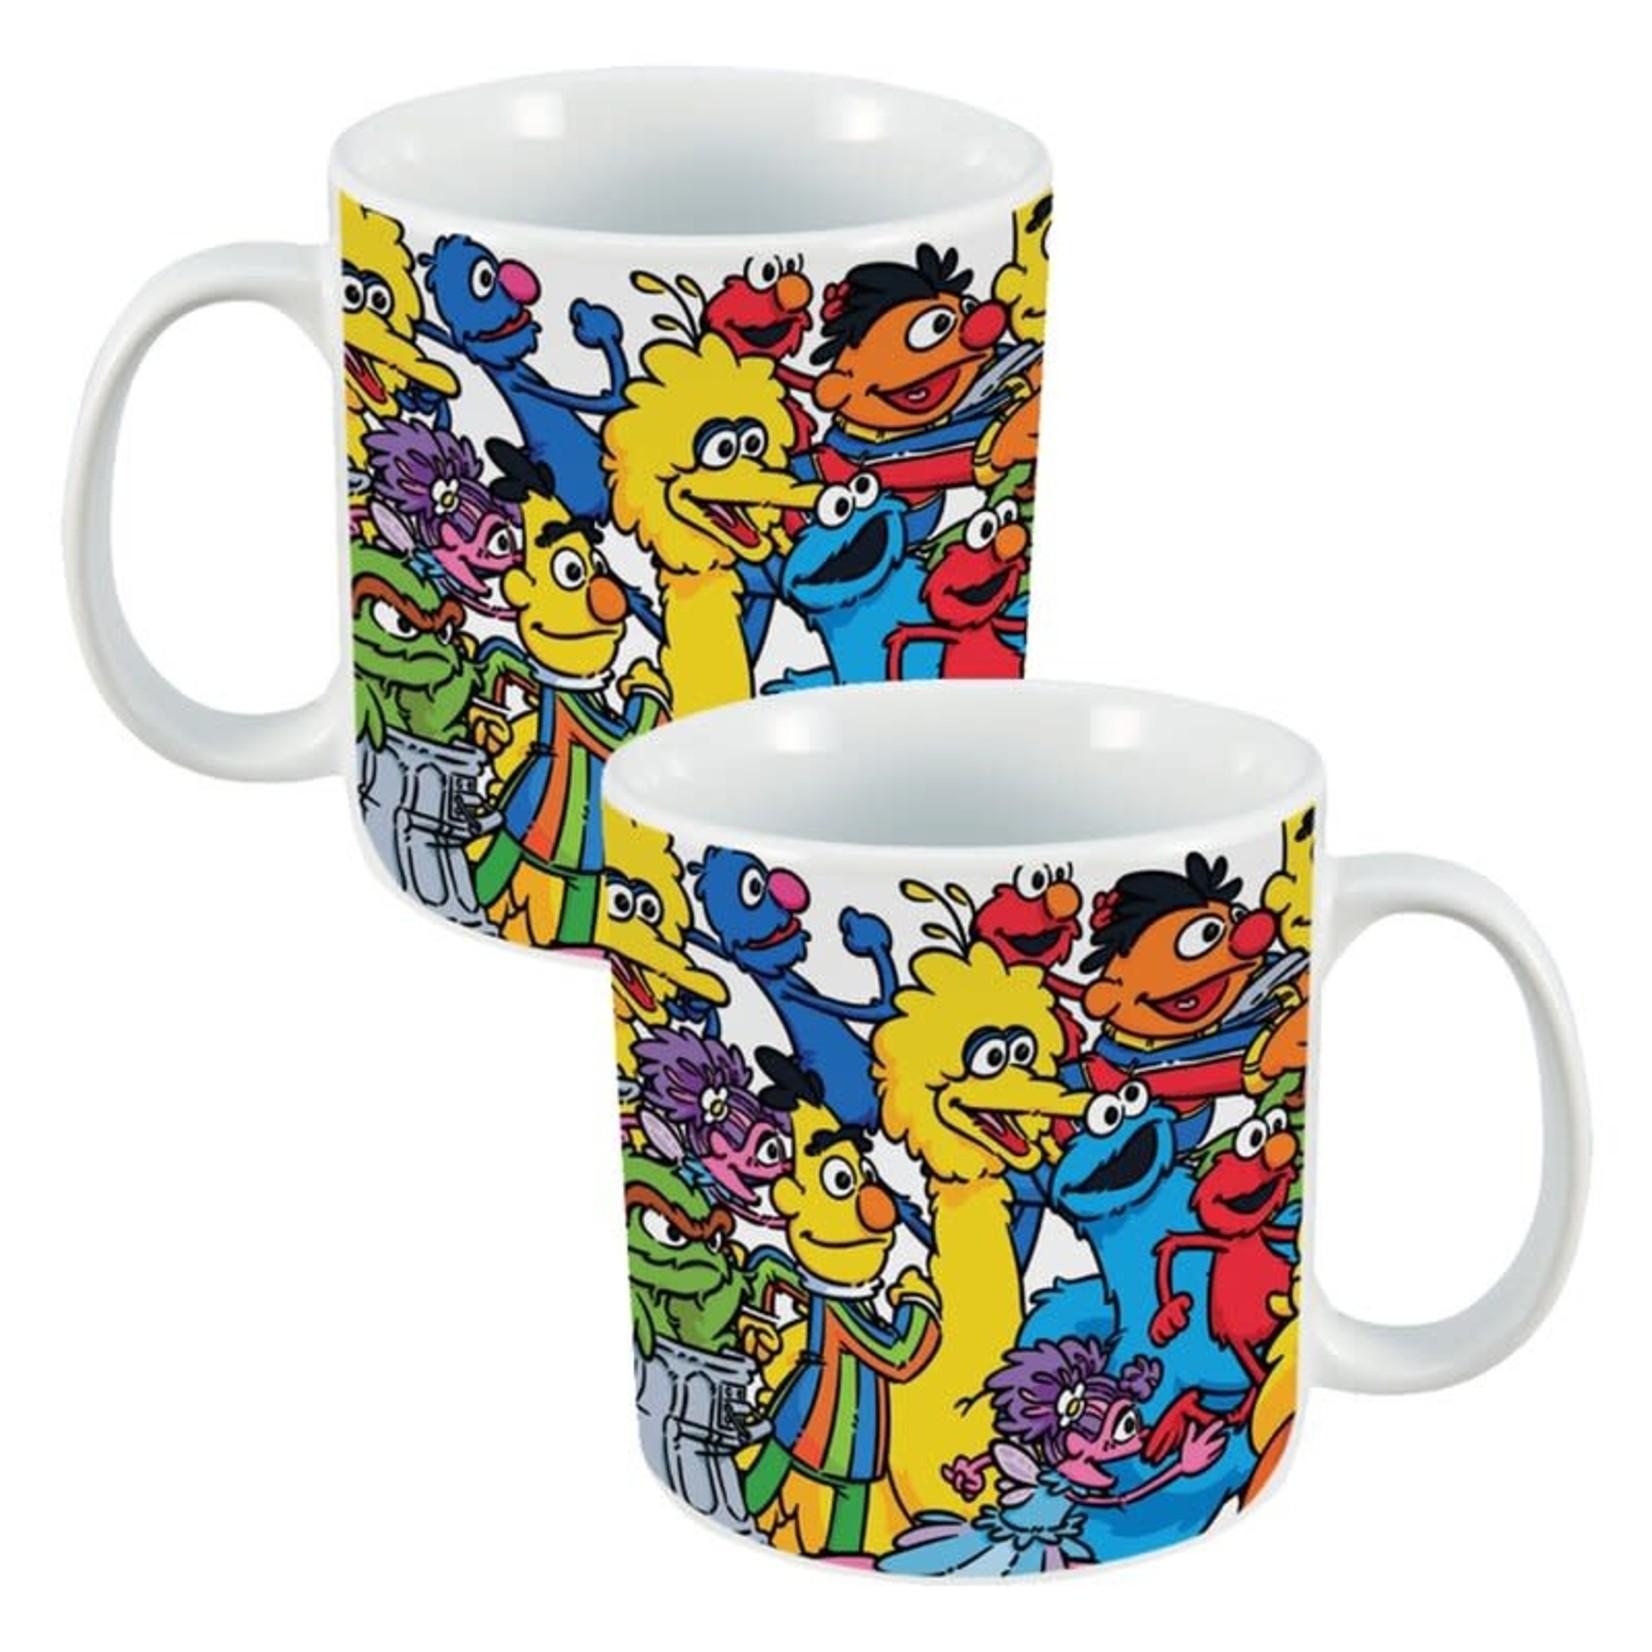 Mug - Sesame Street Friends